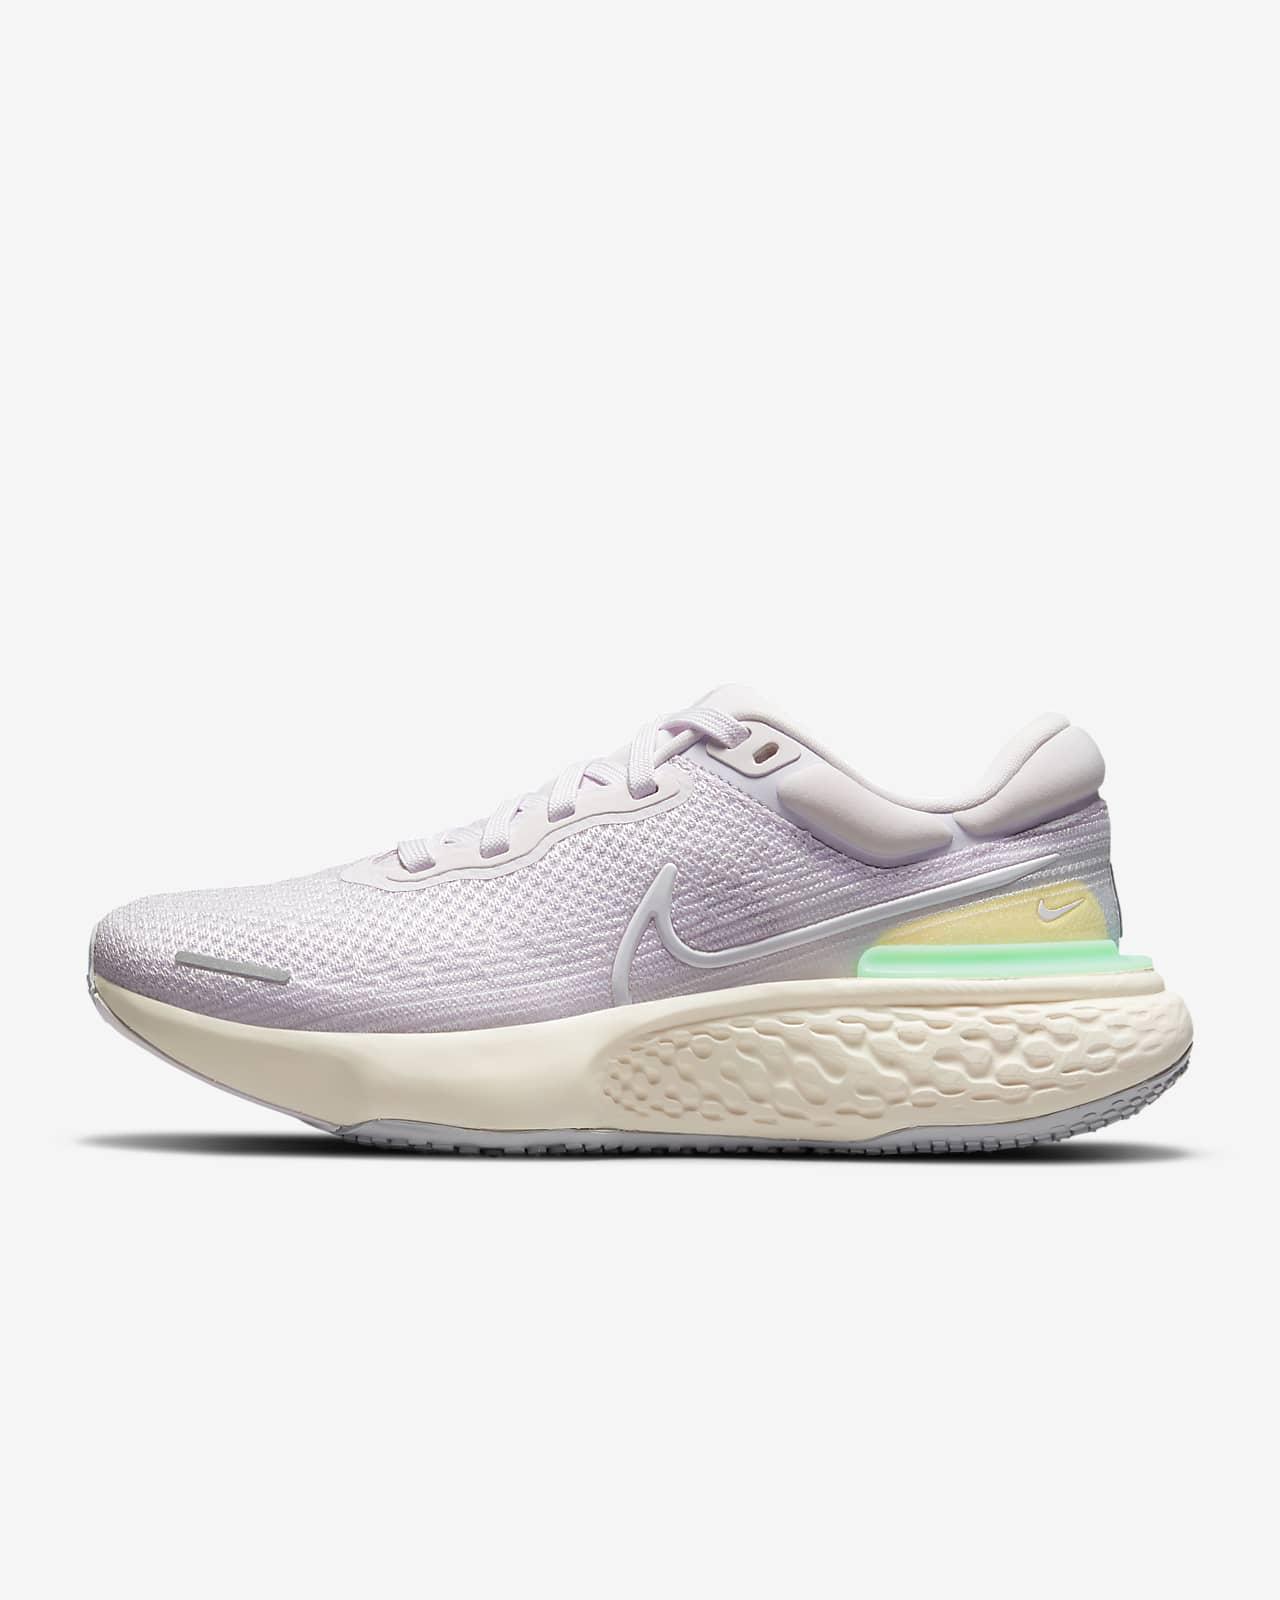 Calzado de running para mujer Nike ZoomX Invincible Run Flyknit